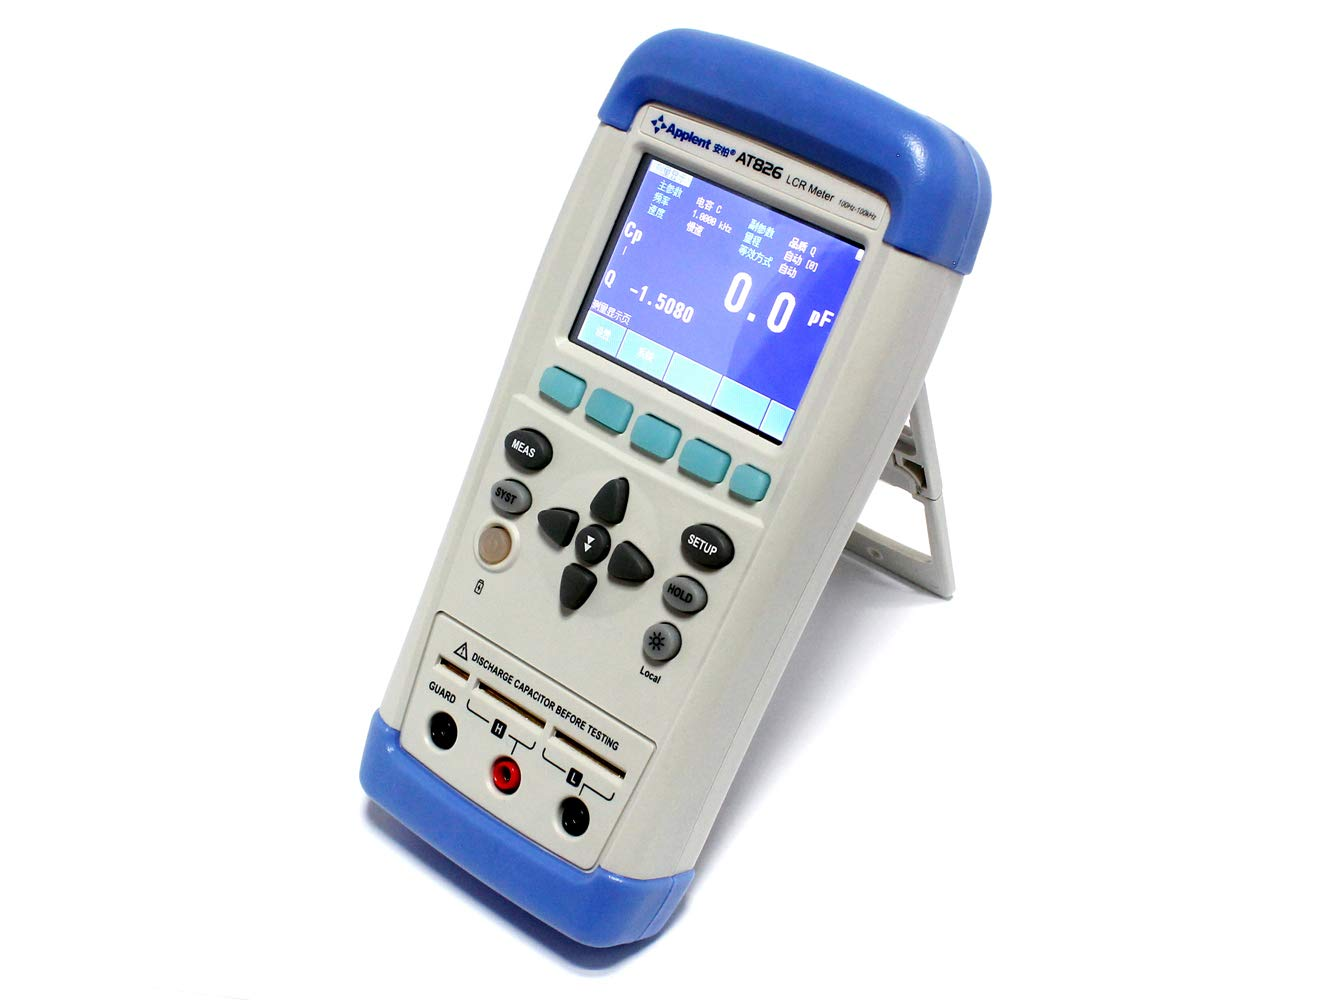 Handheld Digital LCR Meter Tester True-color TFT liquid crystal display ESR Tester Electric Bridge Touchscreen AT826 100Hz 120Hz 1kHz 10kHz 100kHz